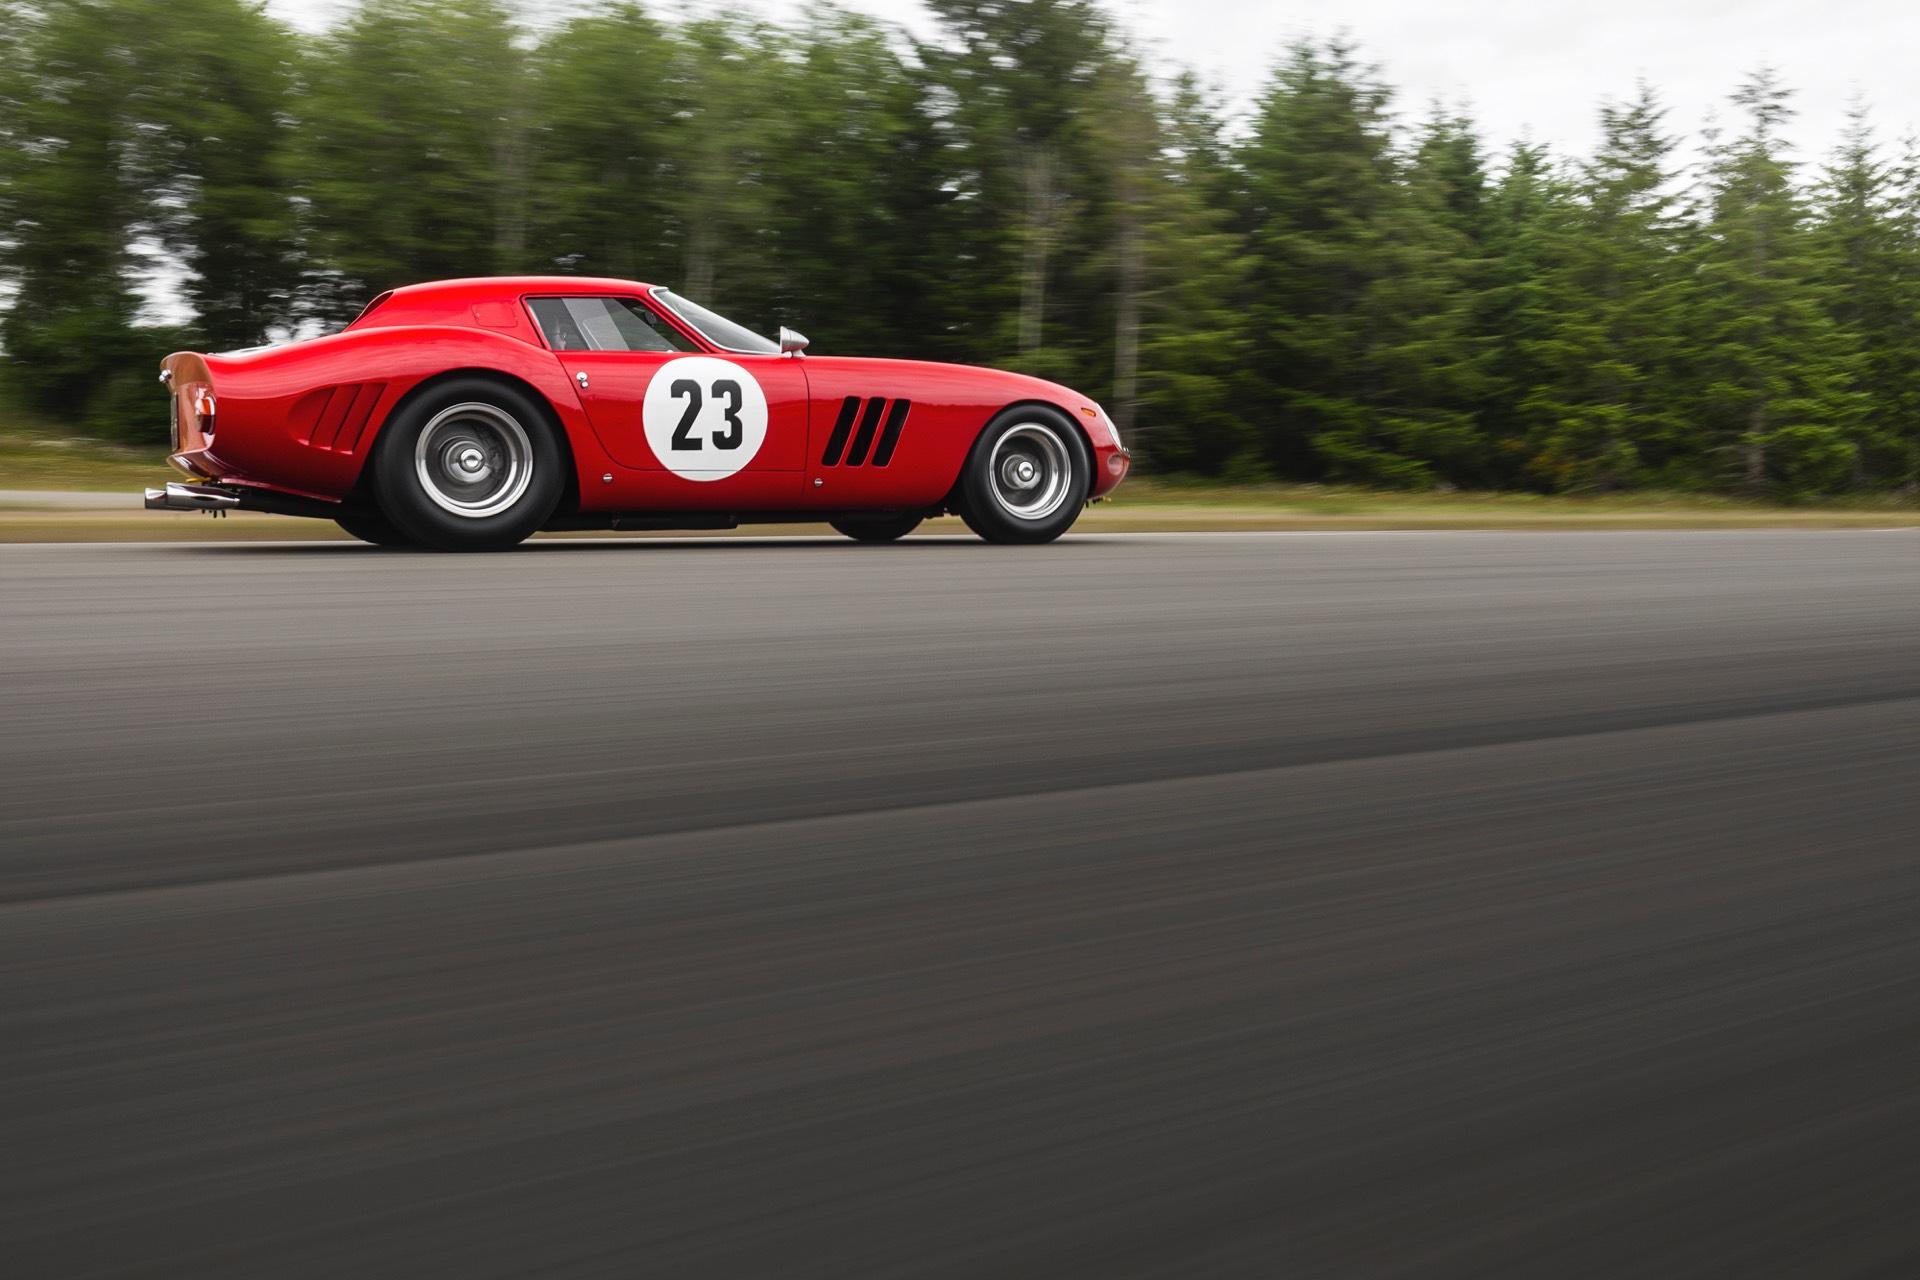 Ferrari 250 GTO RM Sothebys Tracking